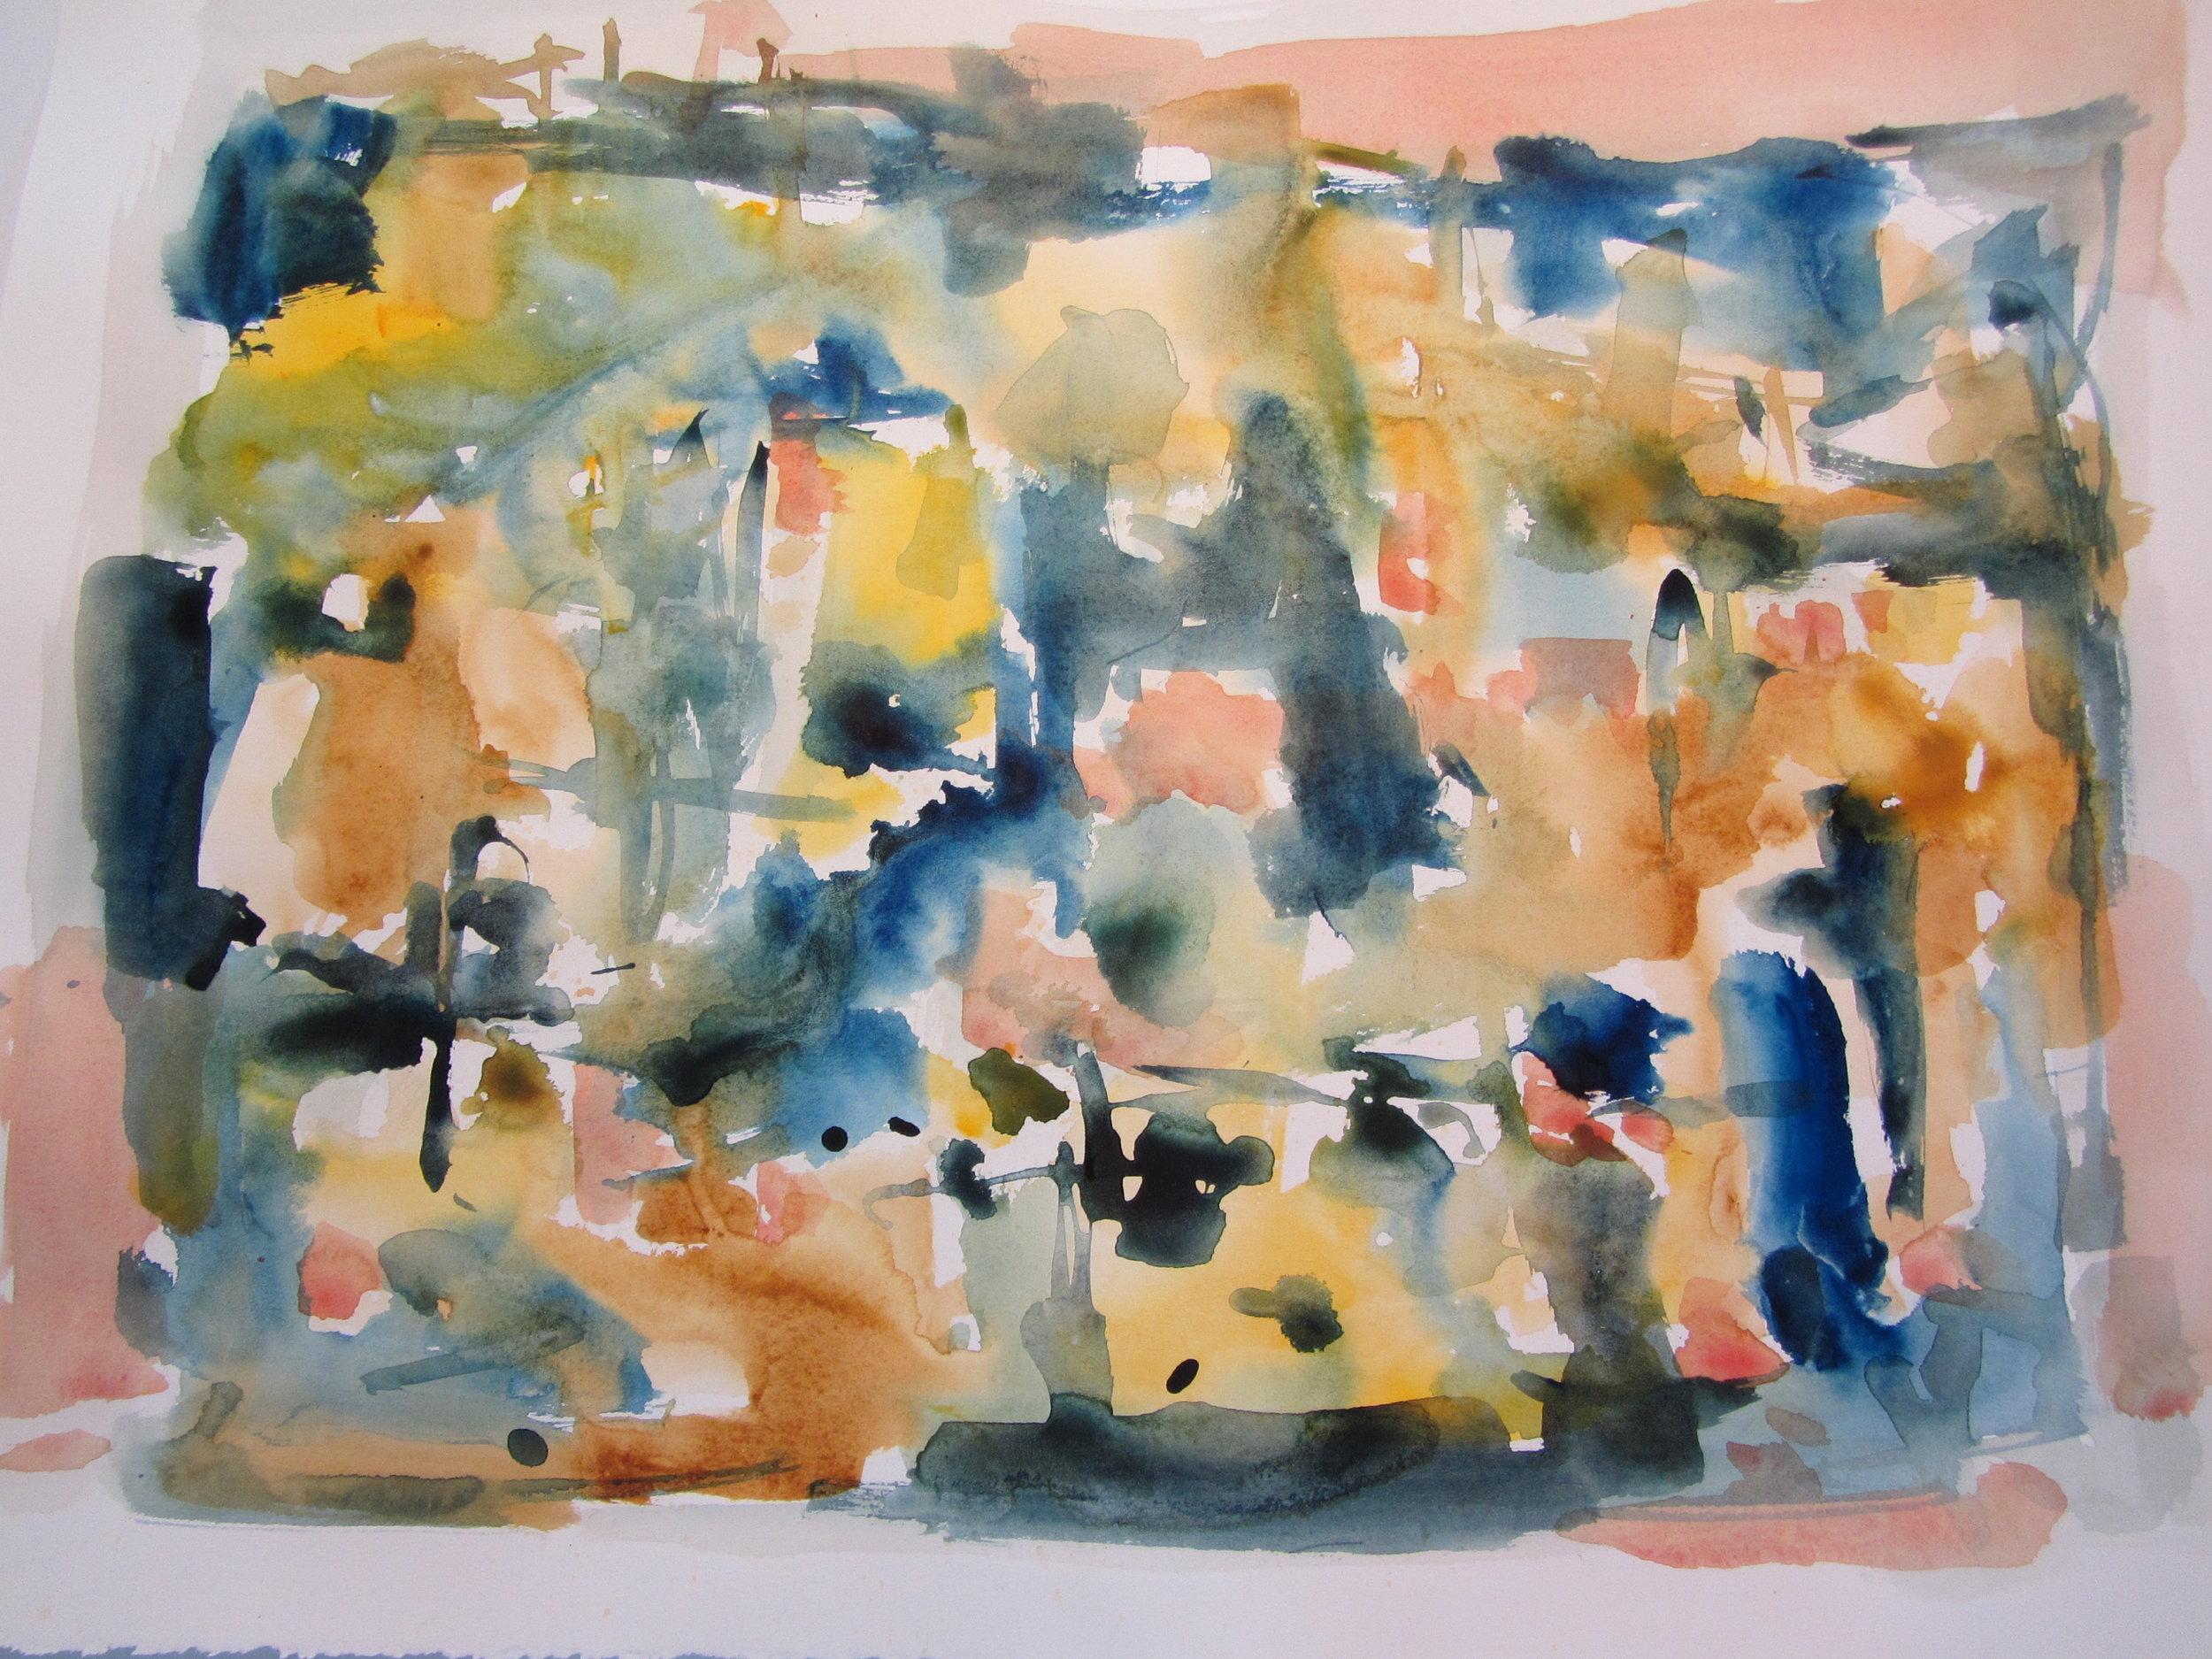 2012, watercolour on paper 58.42 x 76.20cm (23 x 30in.) -  IMG_0014 .JPG